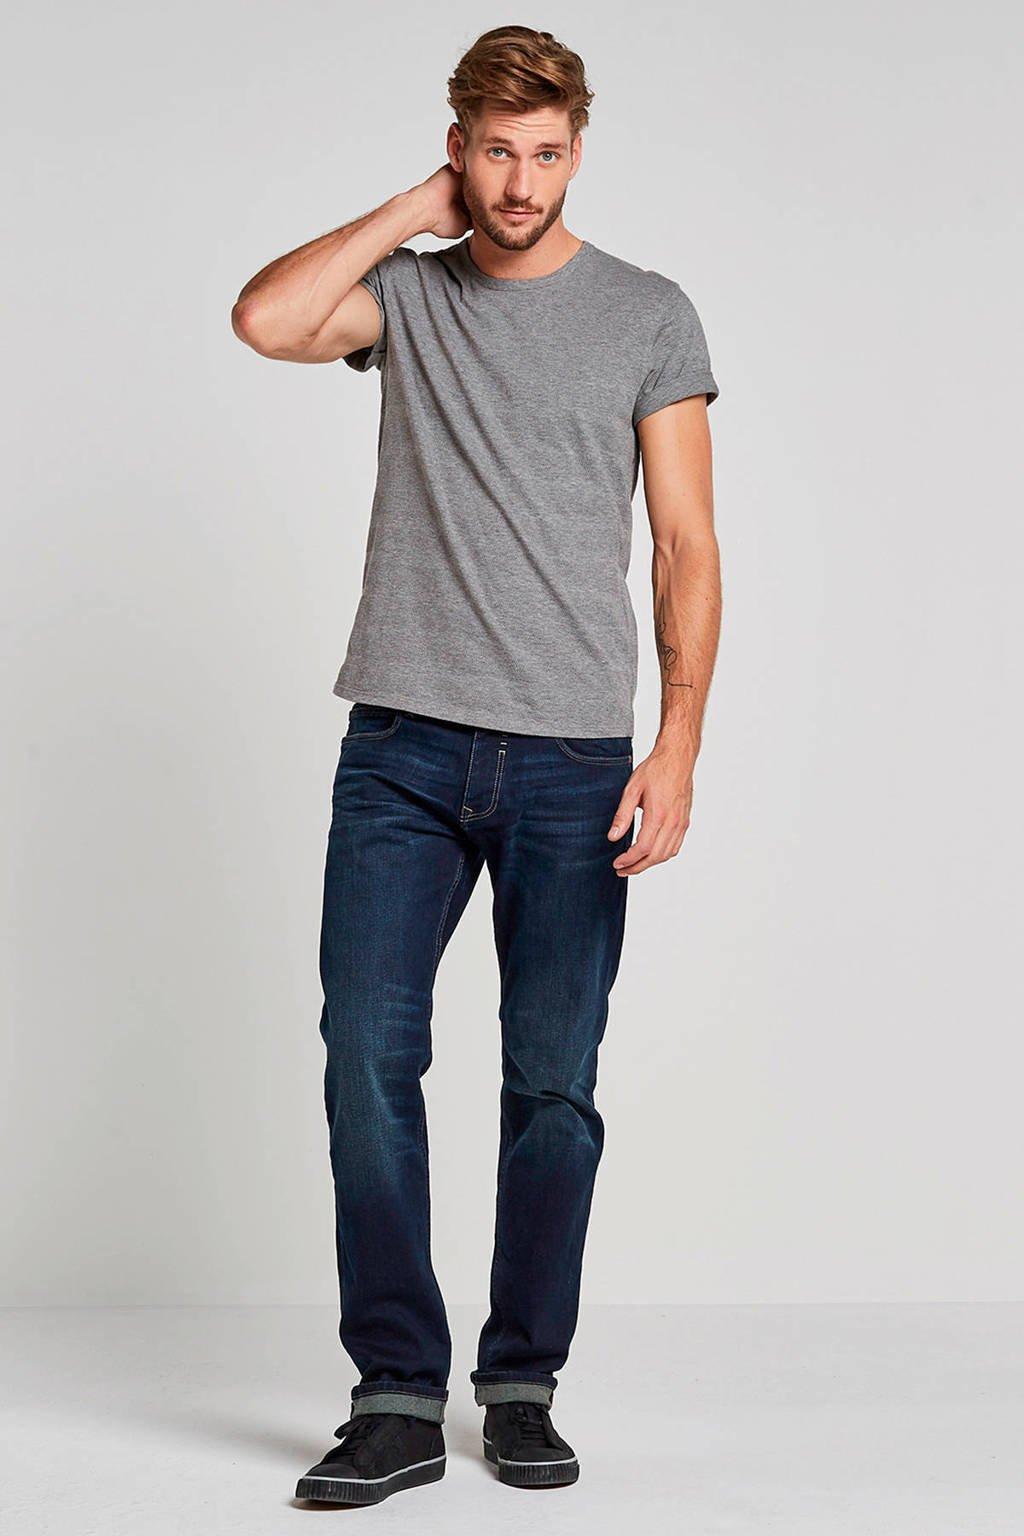 ESPRIT Men Casual regular fit jeans, Dark denim